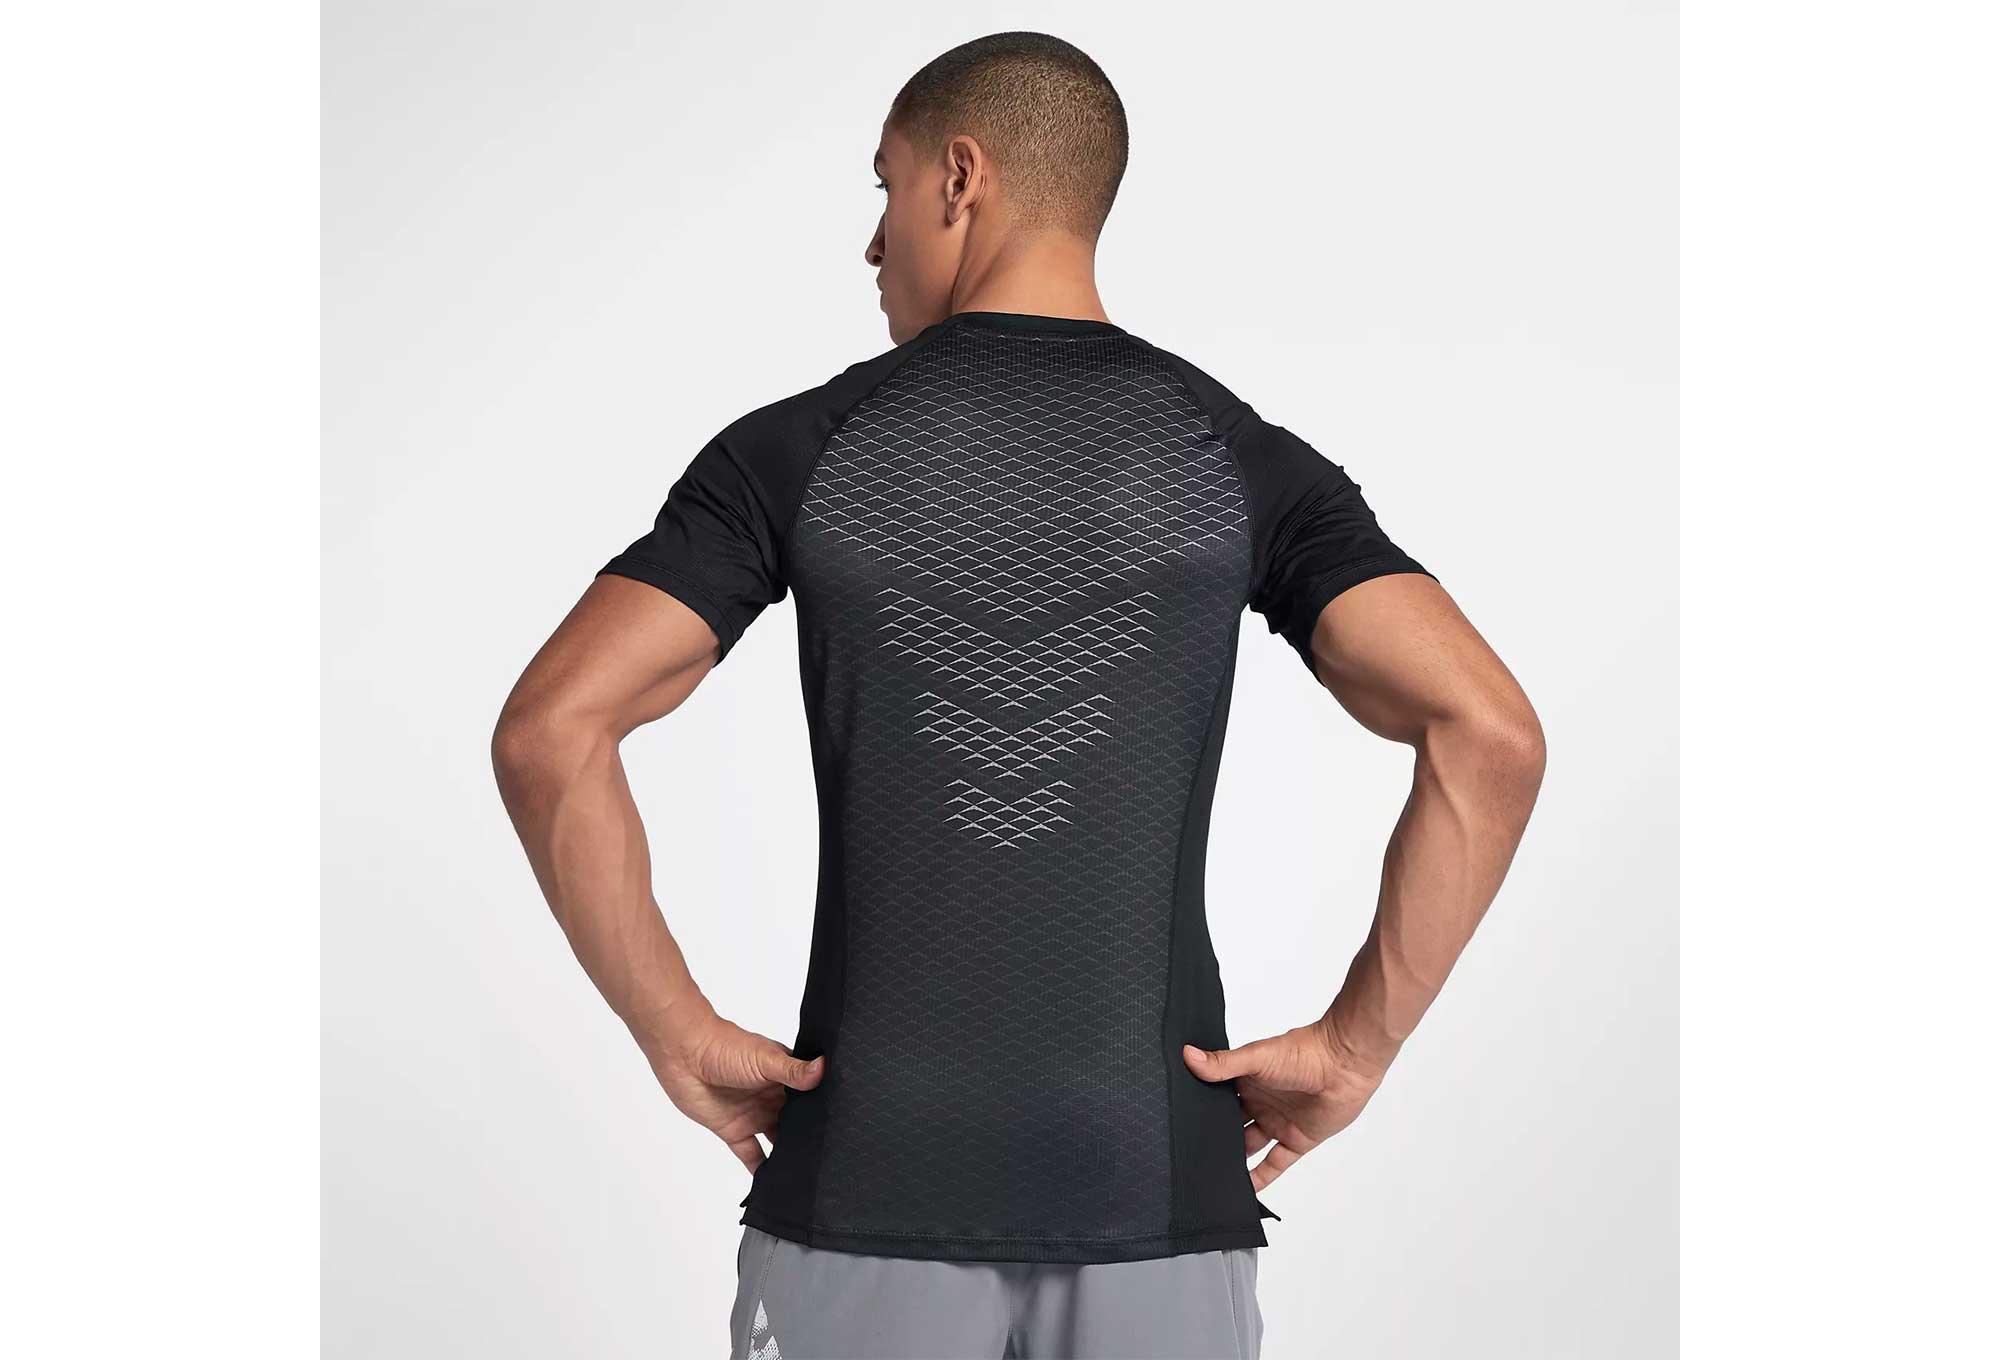 Camiseta de mangas cortas Nike Pro HyperCool negra  a46746770d30a